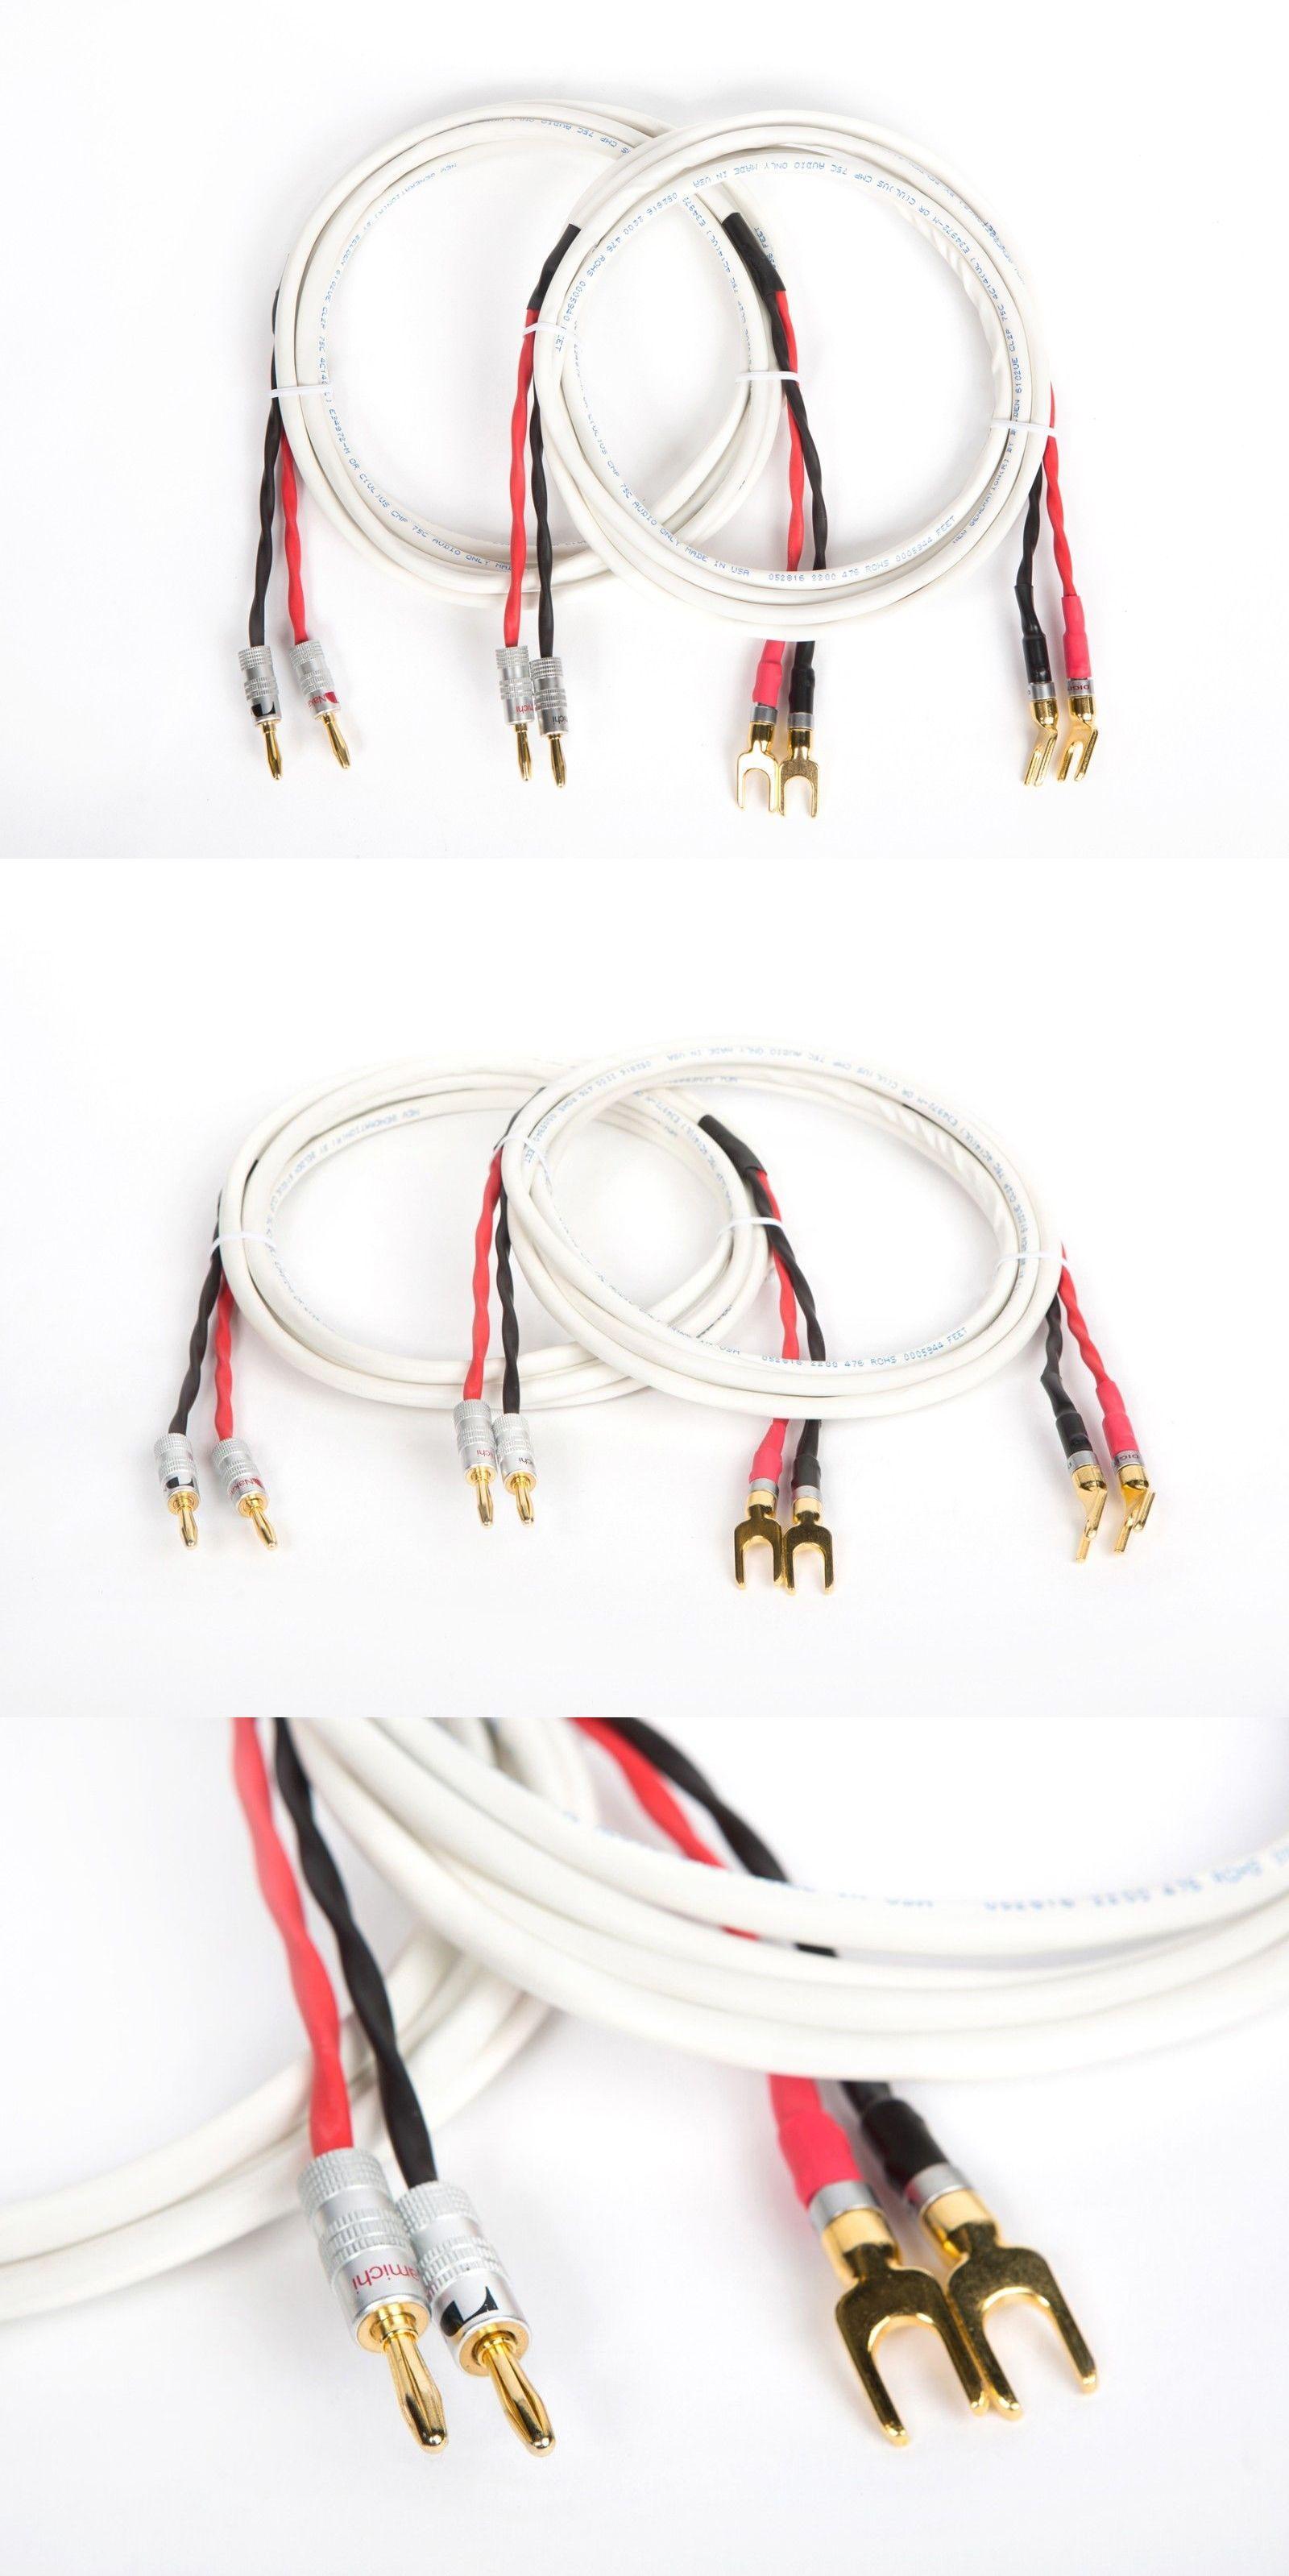 Cat6a Wire Diagram Free Download Tbc Wiring Hmsl Belden Cat 6 5e2d9ee3ae4692bffaaf92b02b17f542 Diagramhtml